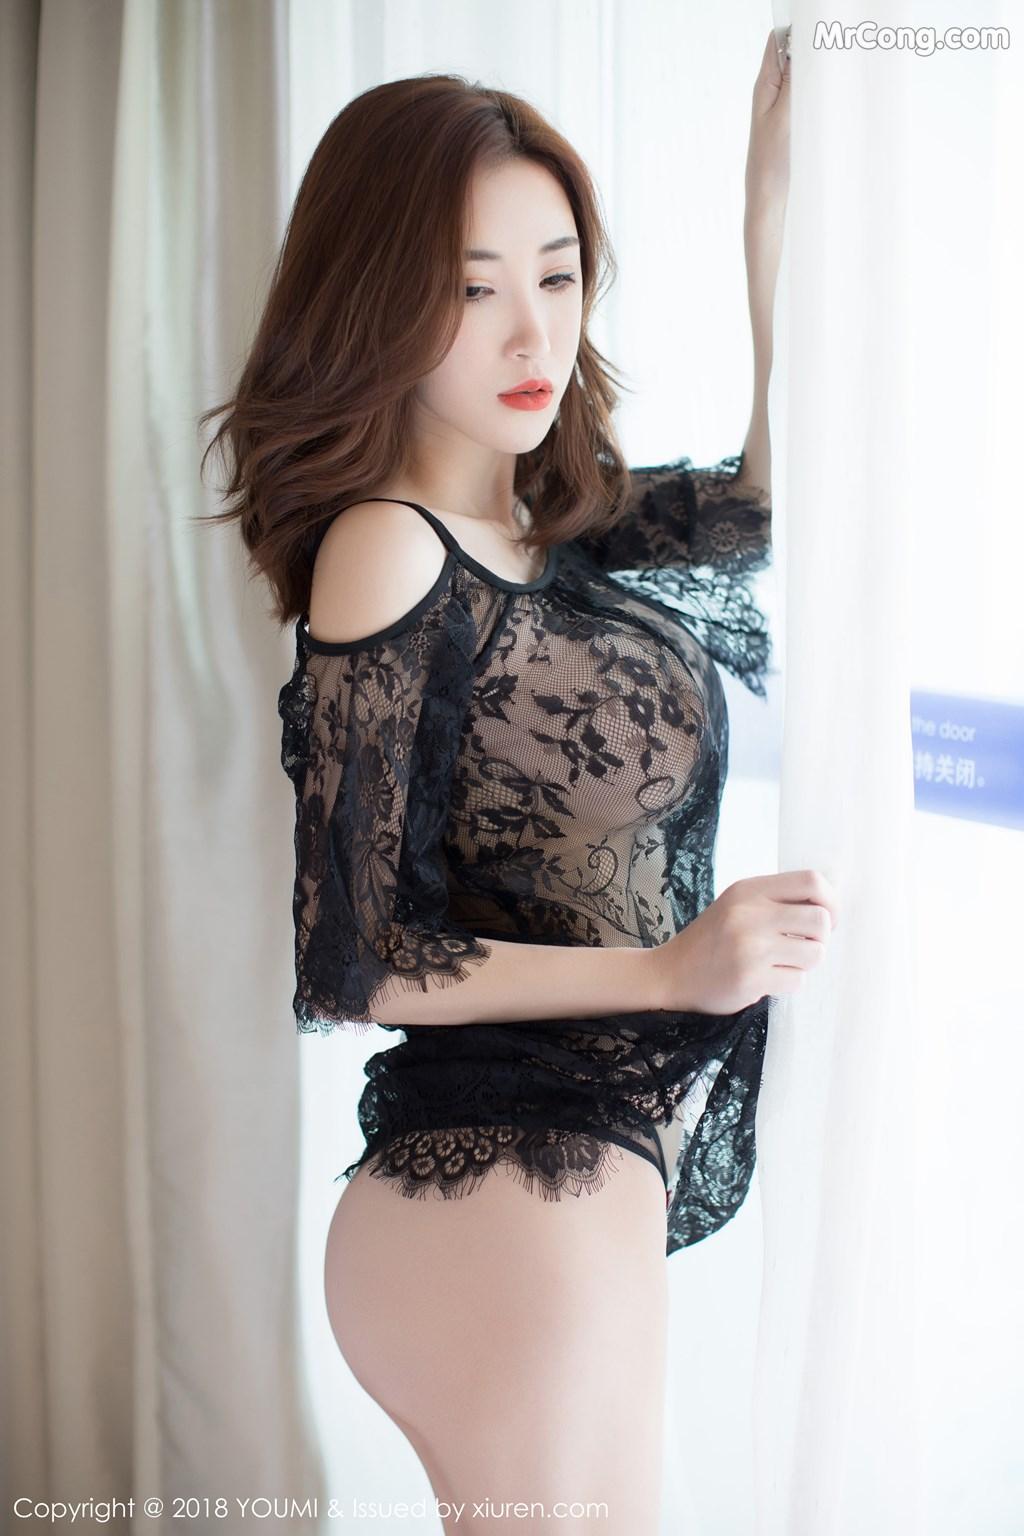 Image YouMi-Vol.219-Sun-Meng-Yao-V-MrCong.com-003 in post YouMi Vol.219: Người mẫu Sun Meng Yao (孙梦瑶V) (48 ảnh)